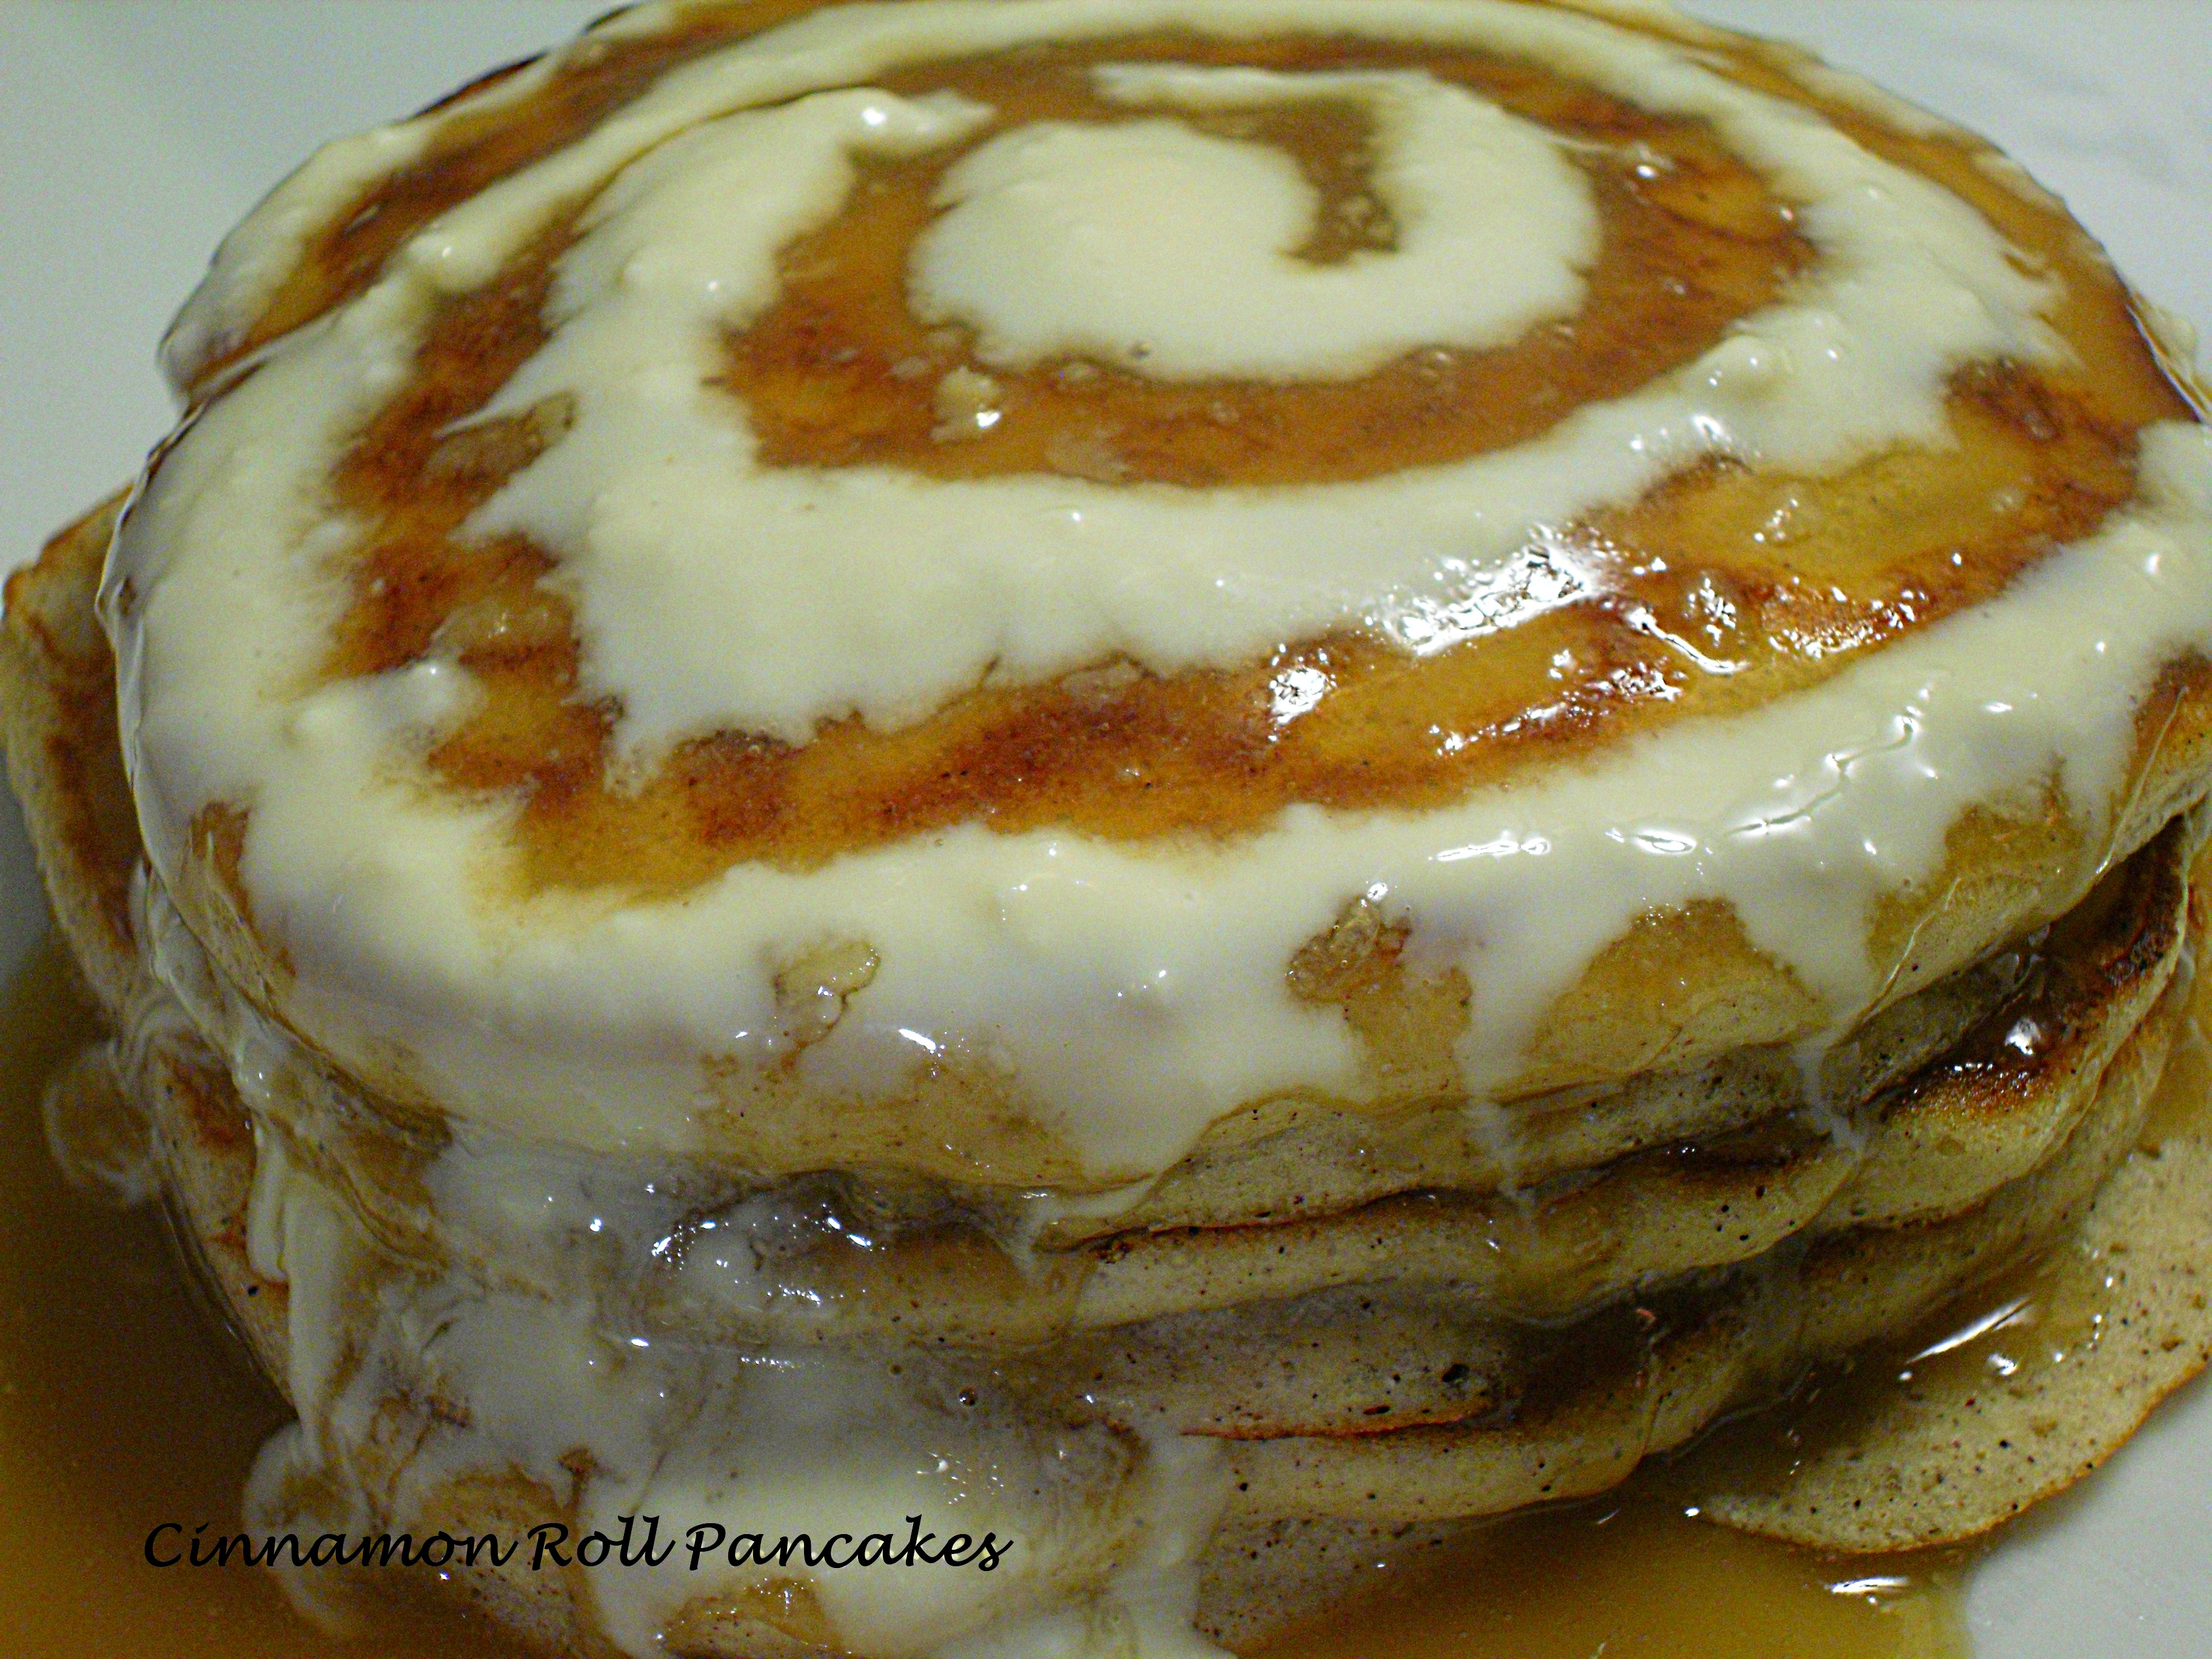 Recipes Course Breakfast Pancakes Cinnamon Roll Pancakes